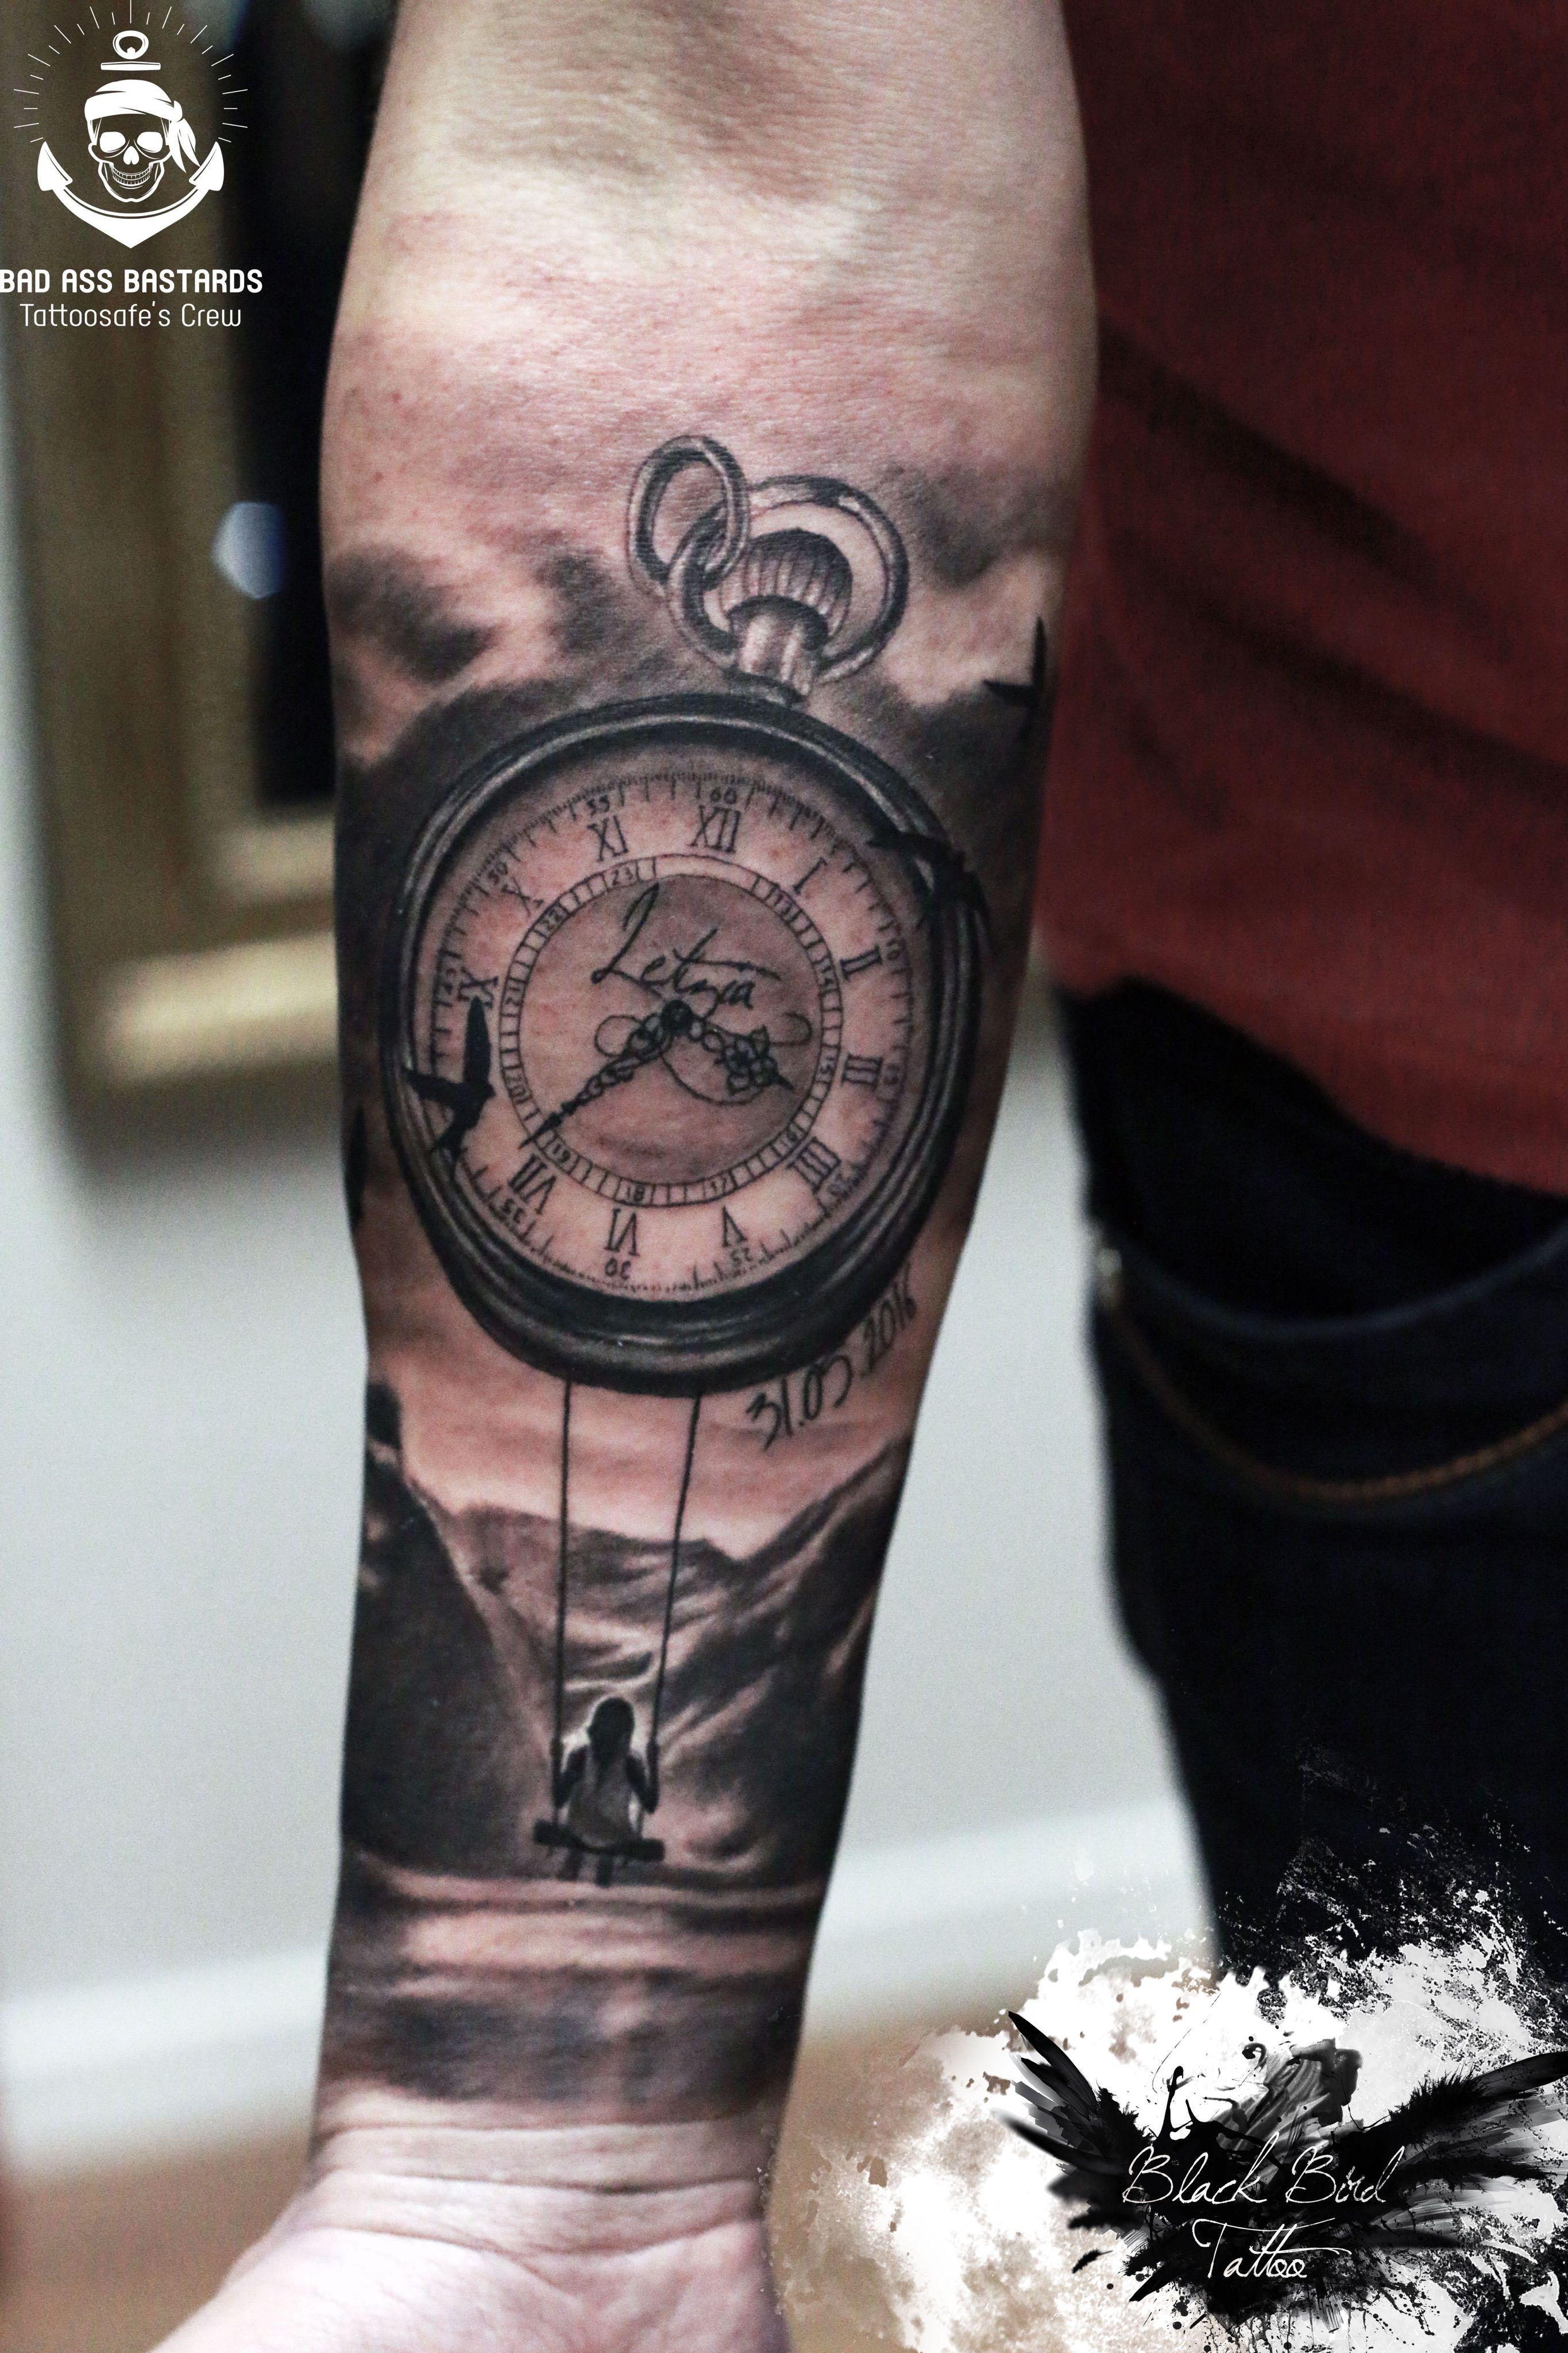 Pocket Watch Tattoo Design Ideas 0 In 2020 Wrist Tattoos For Guys Clock Tattoo Sleeve Tattoos For Guys